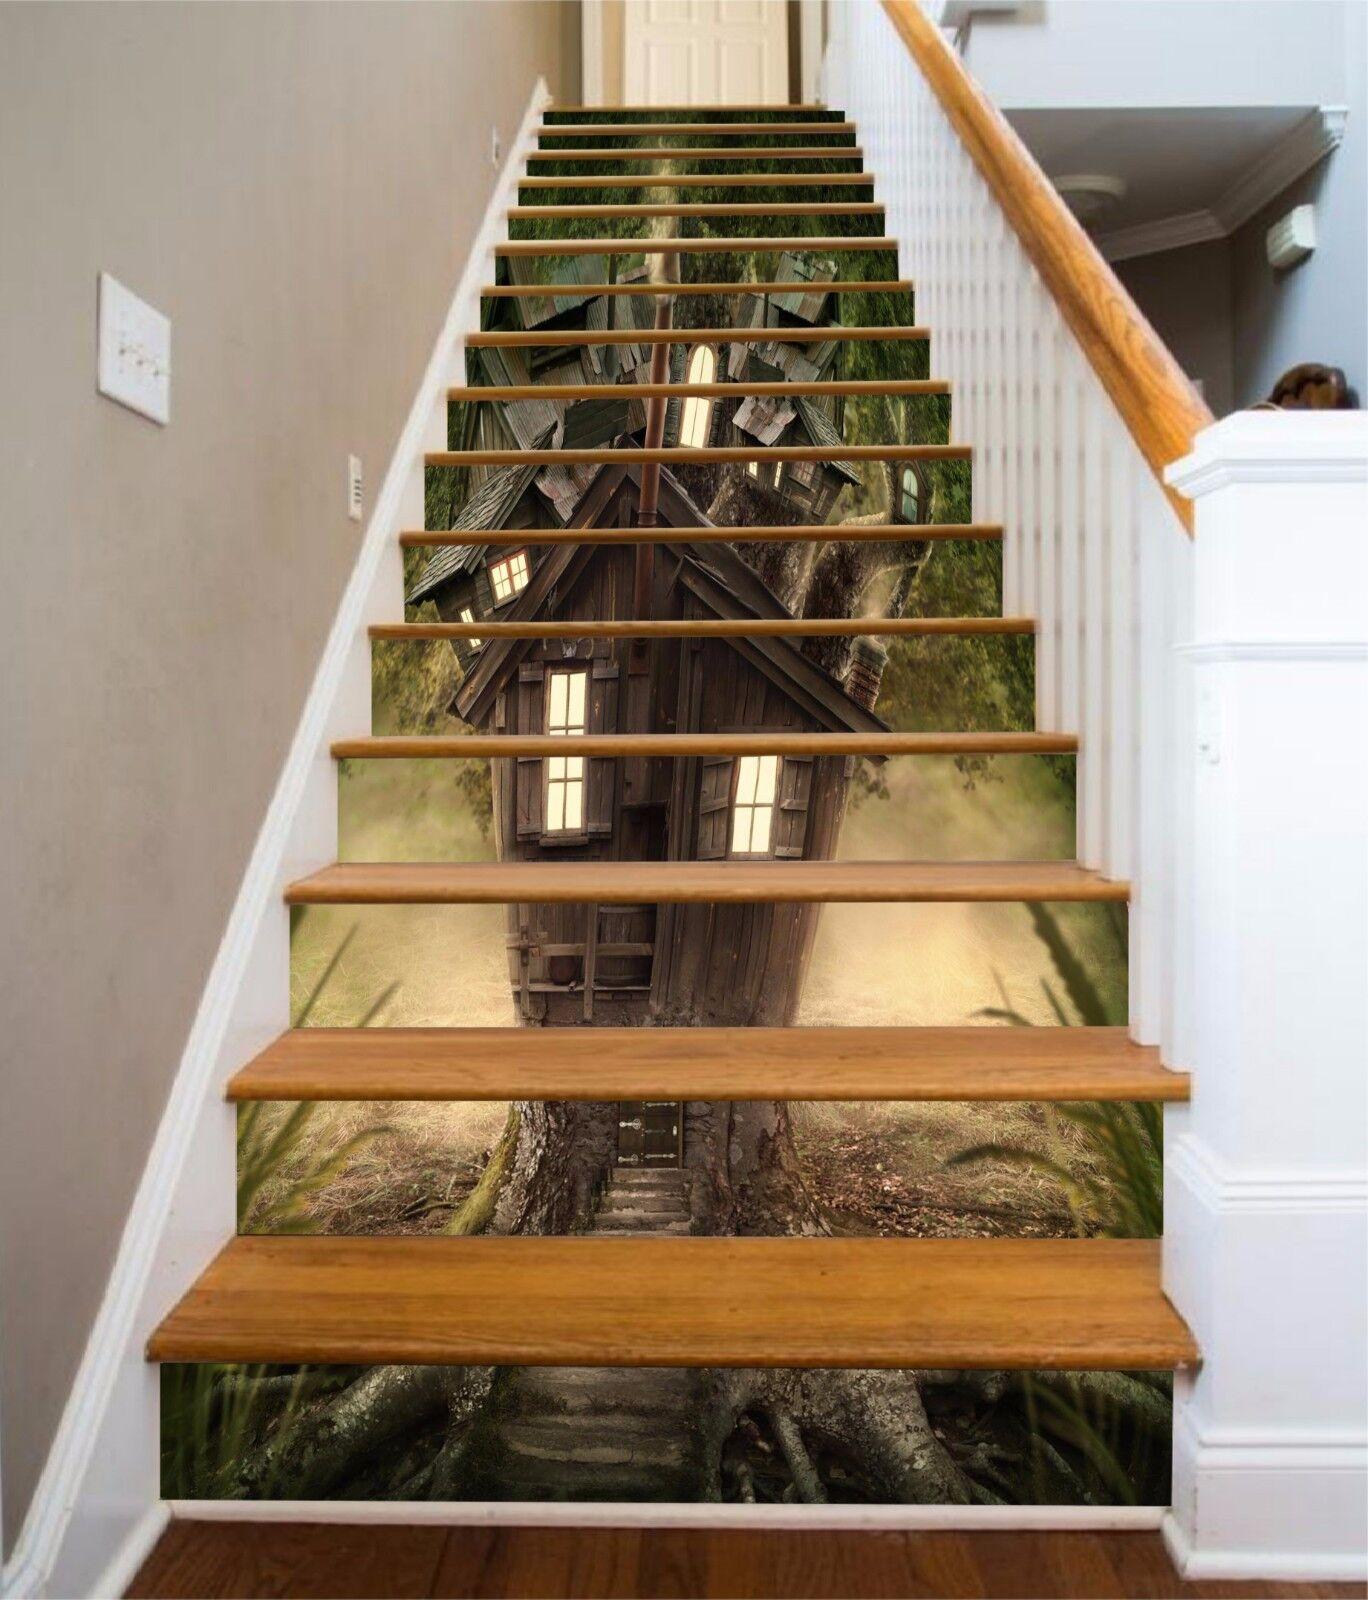 3D Baum Haus 7468 Stair Risers Dekoration Fototapete Vinyl Aufkleber Tapete DE